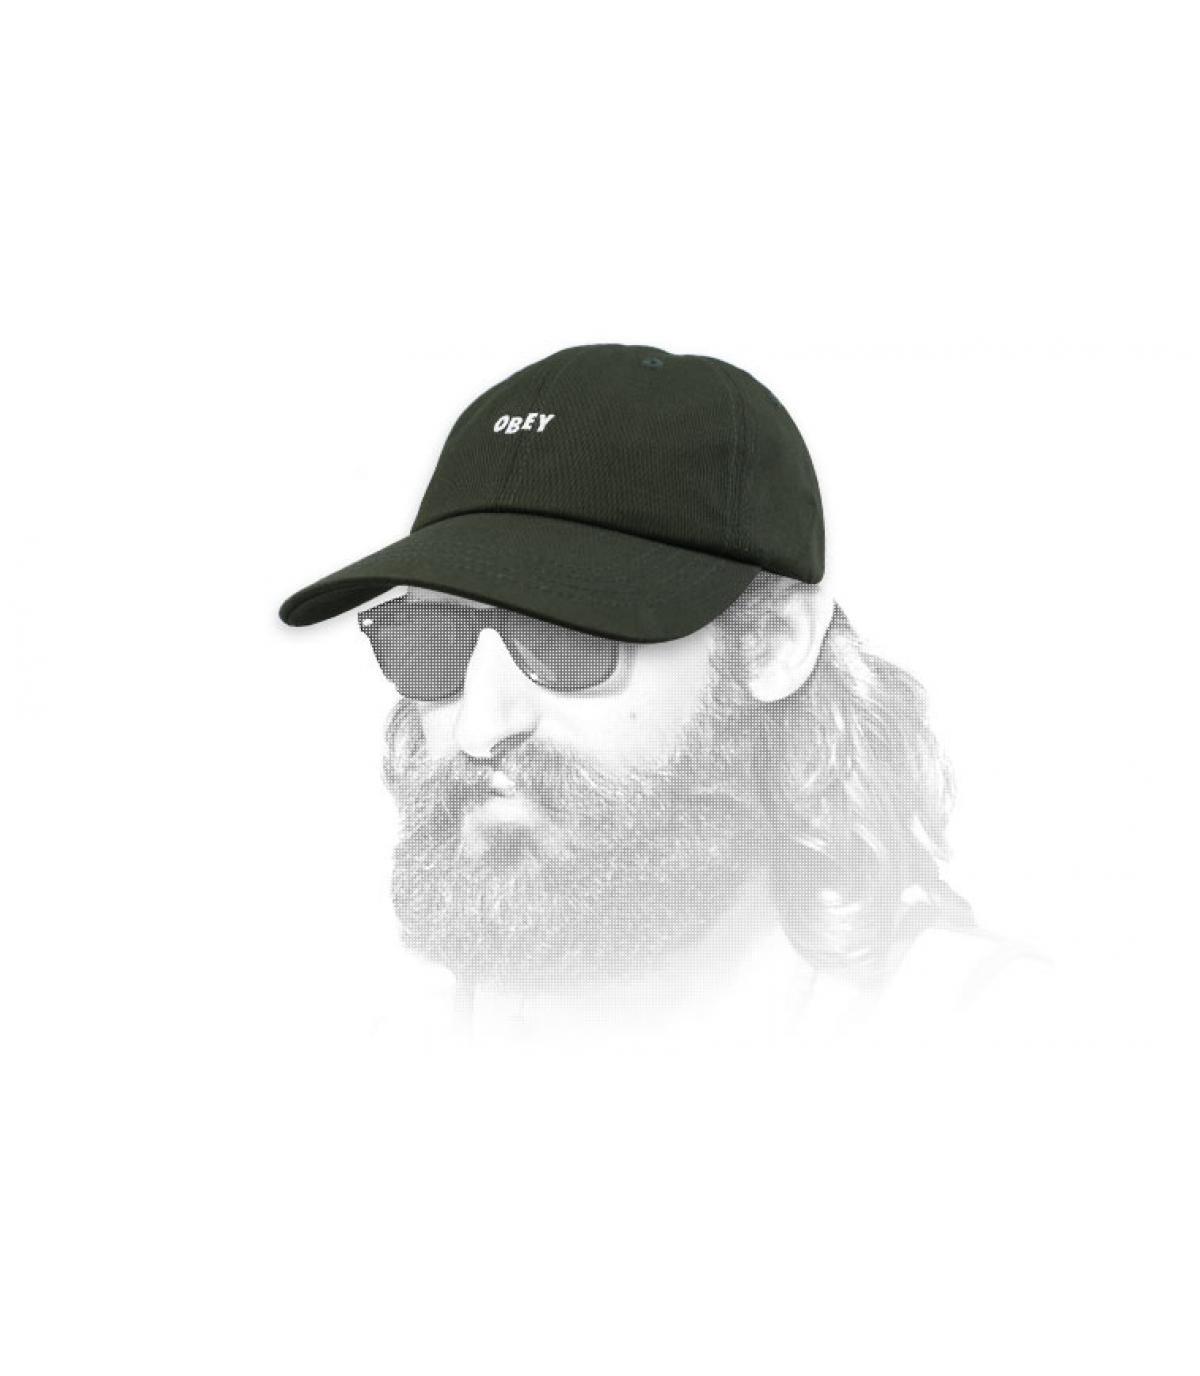 gorra verde Obey